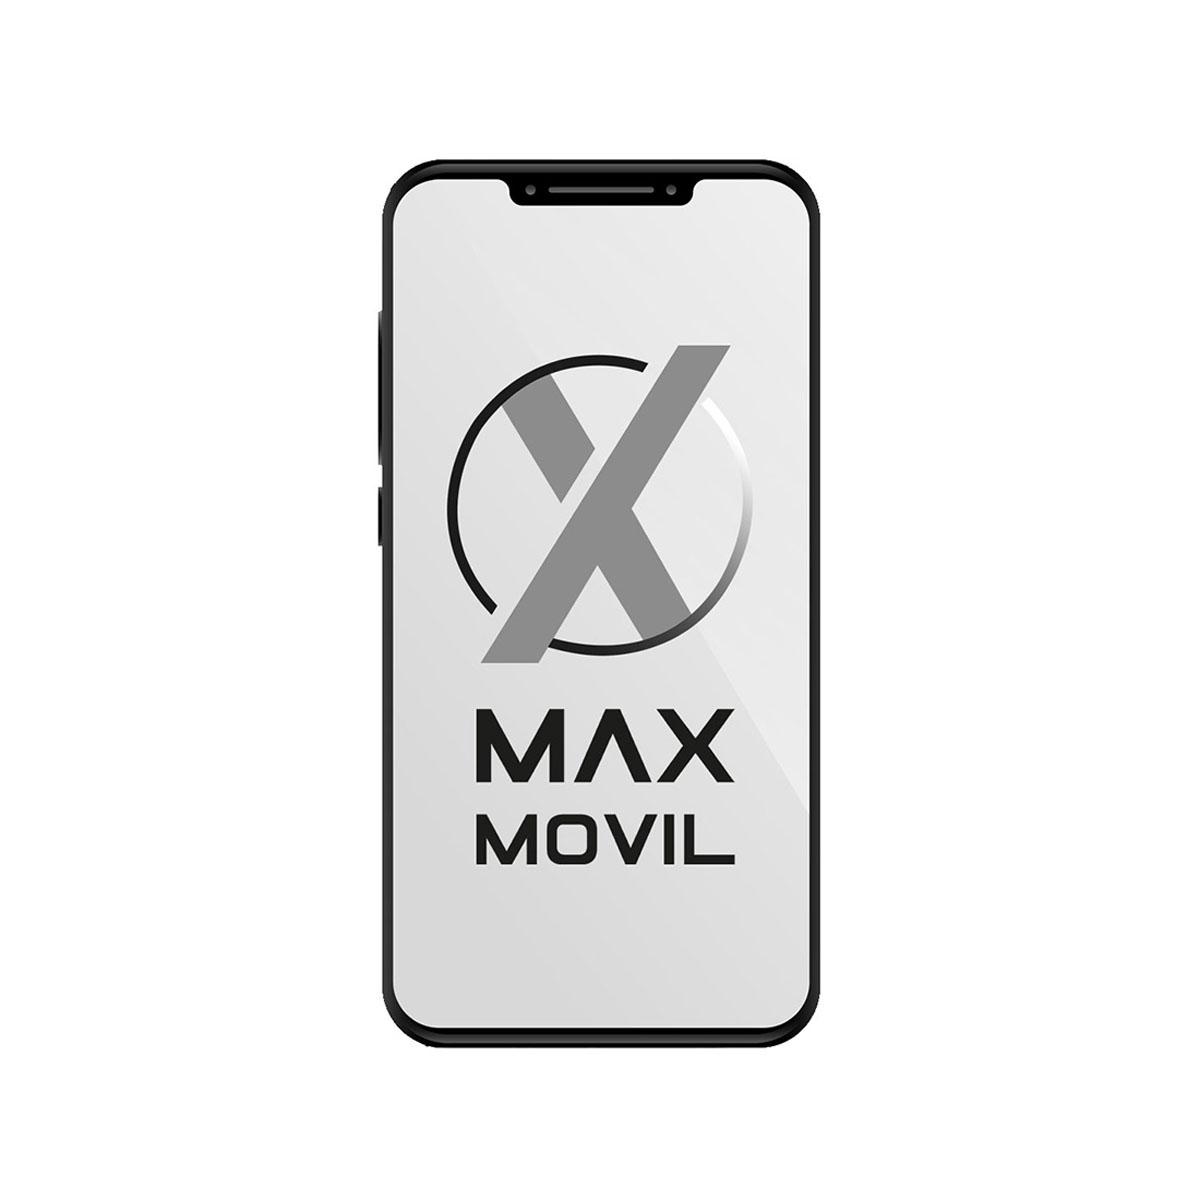 Funda Smart Cover blanca para Huawei MediaPad M2